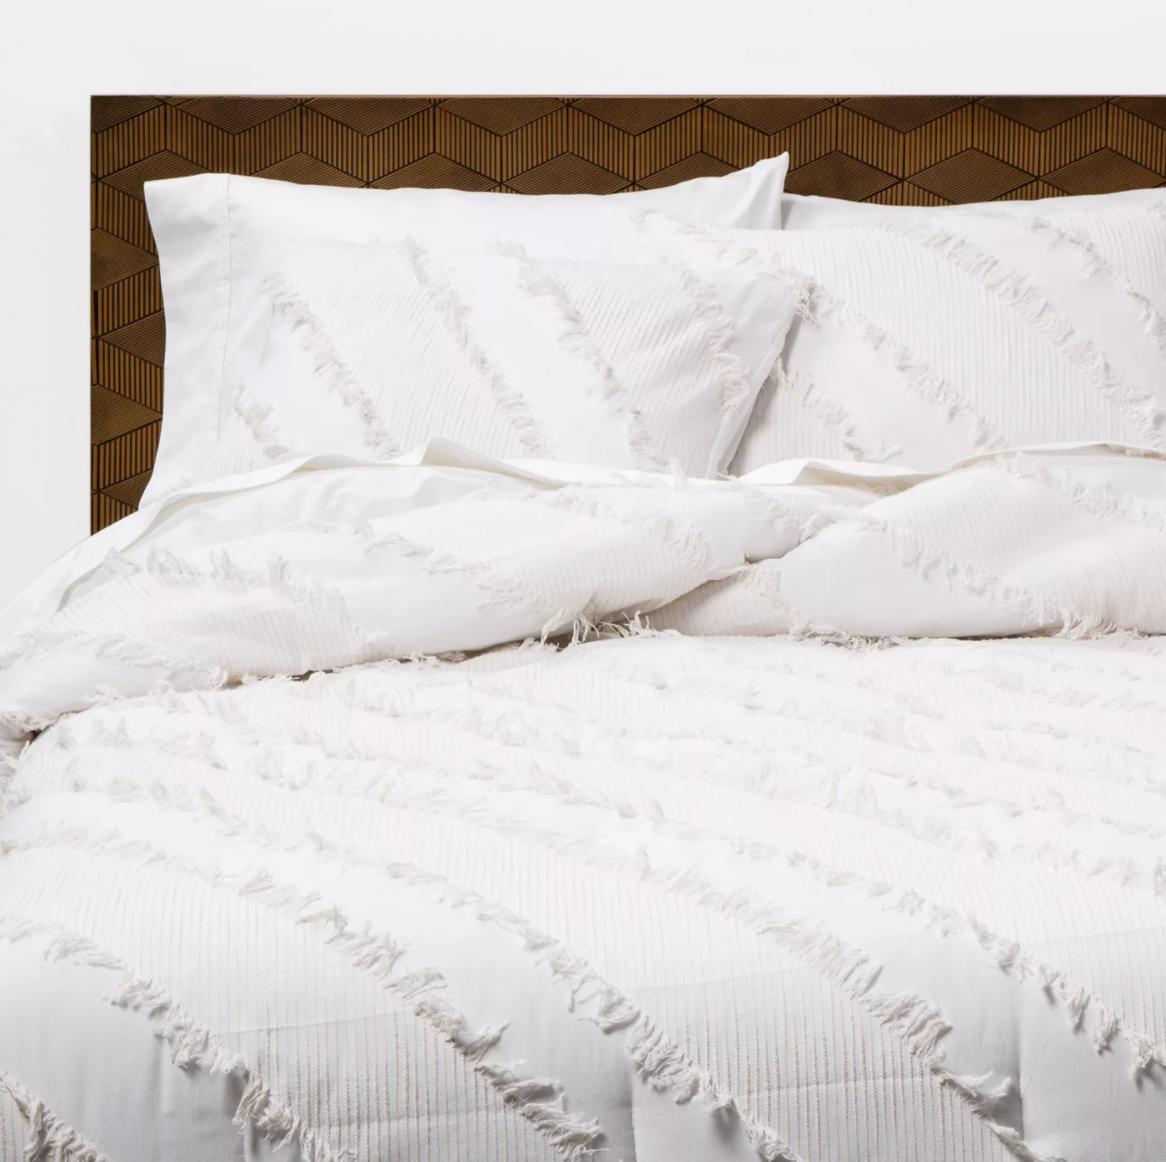 dorm bedding bundles